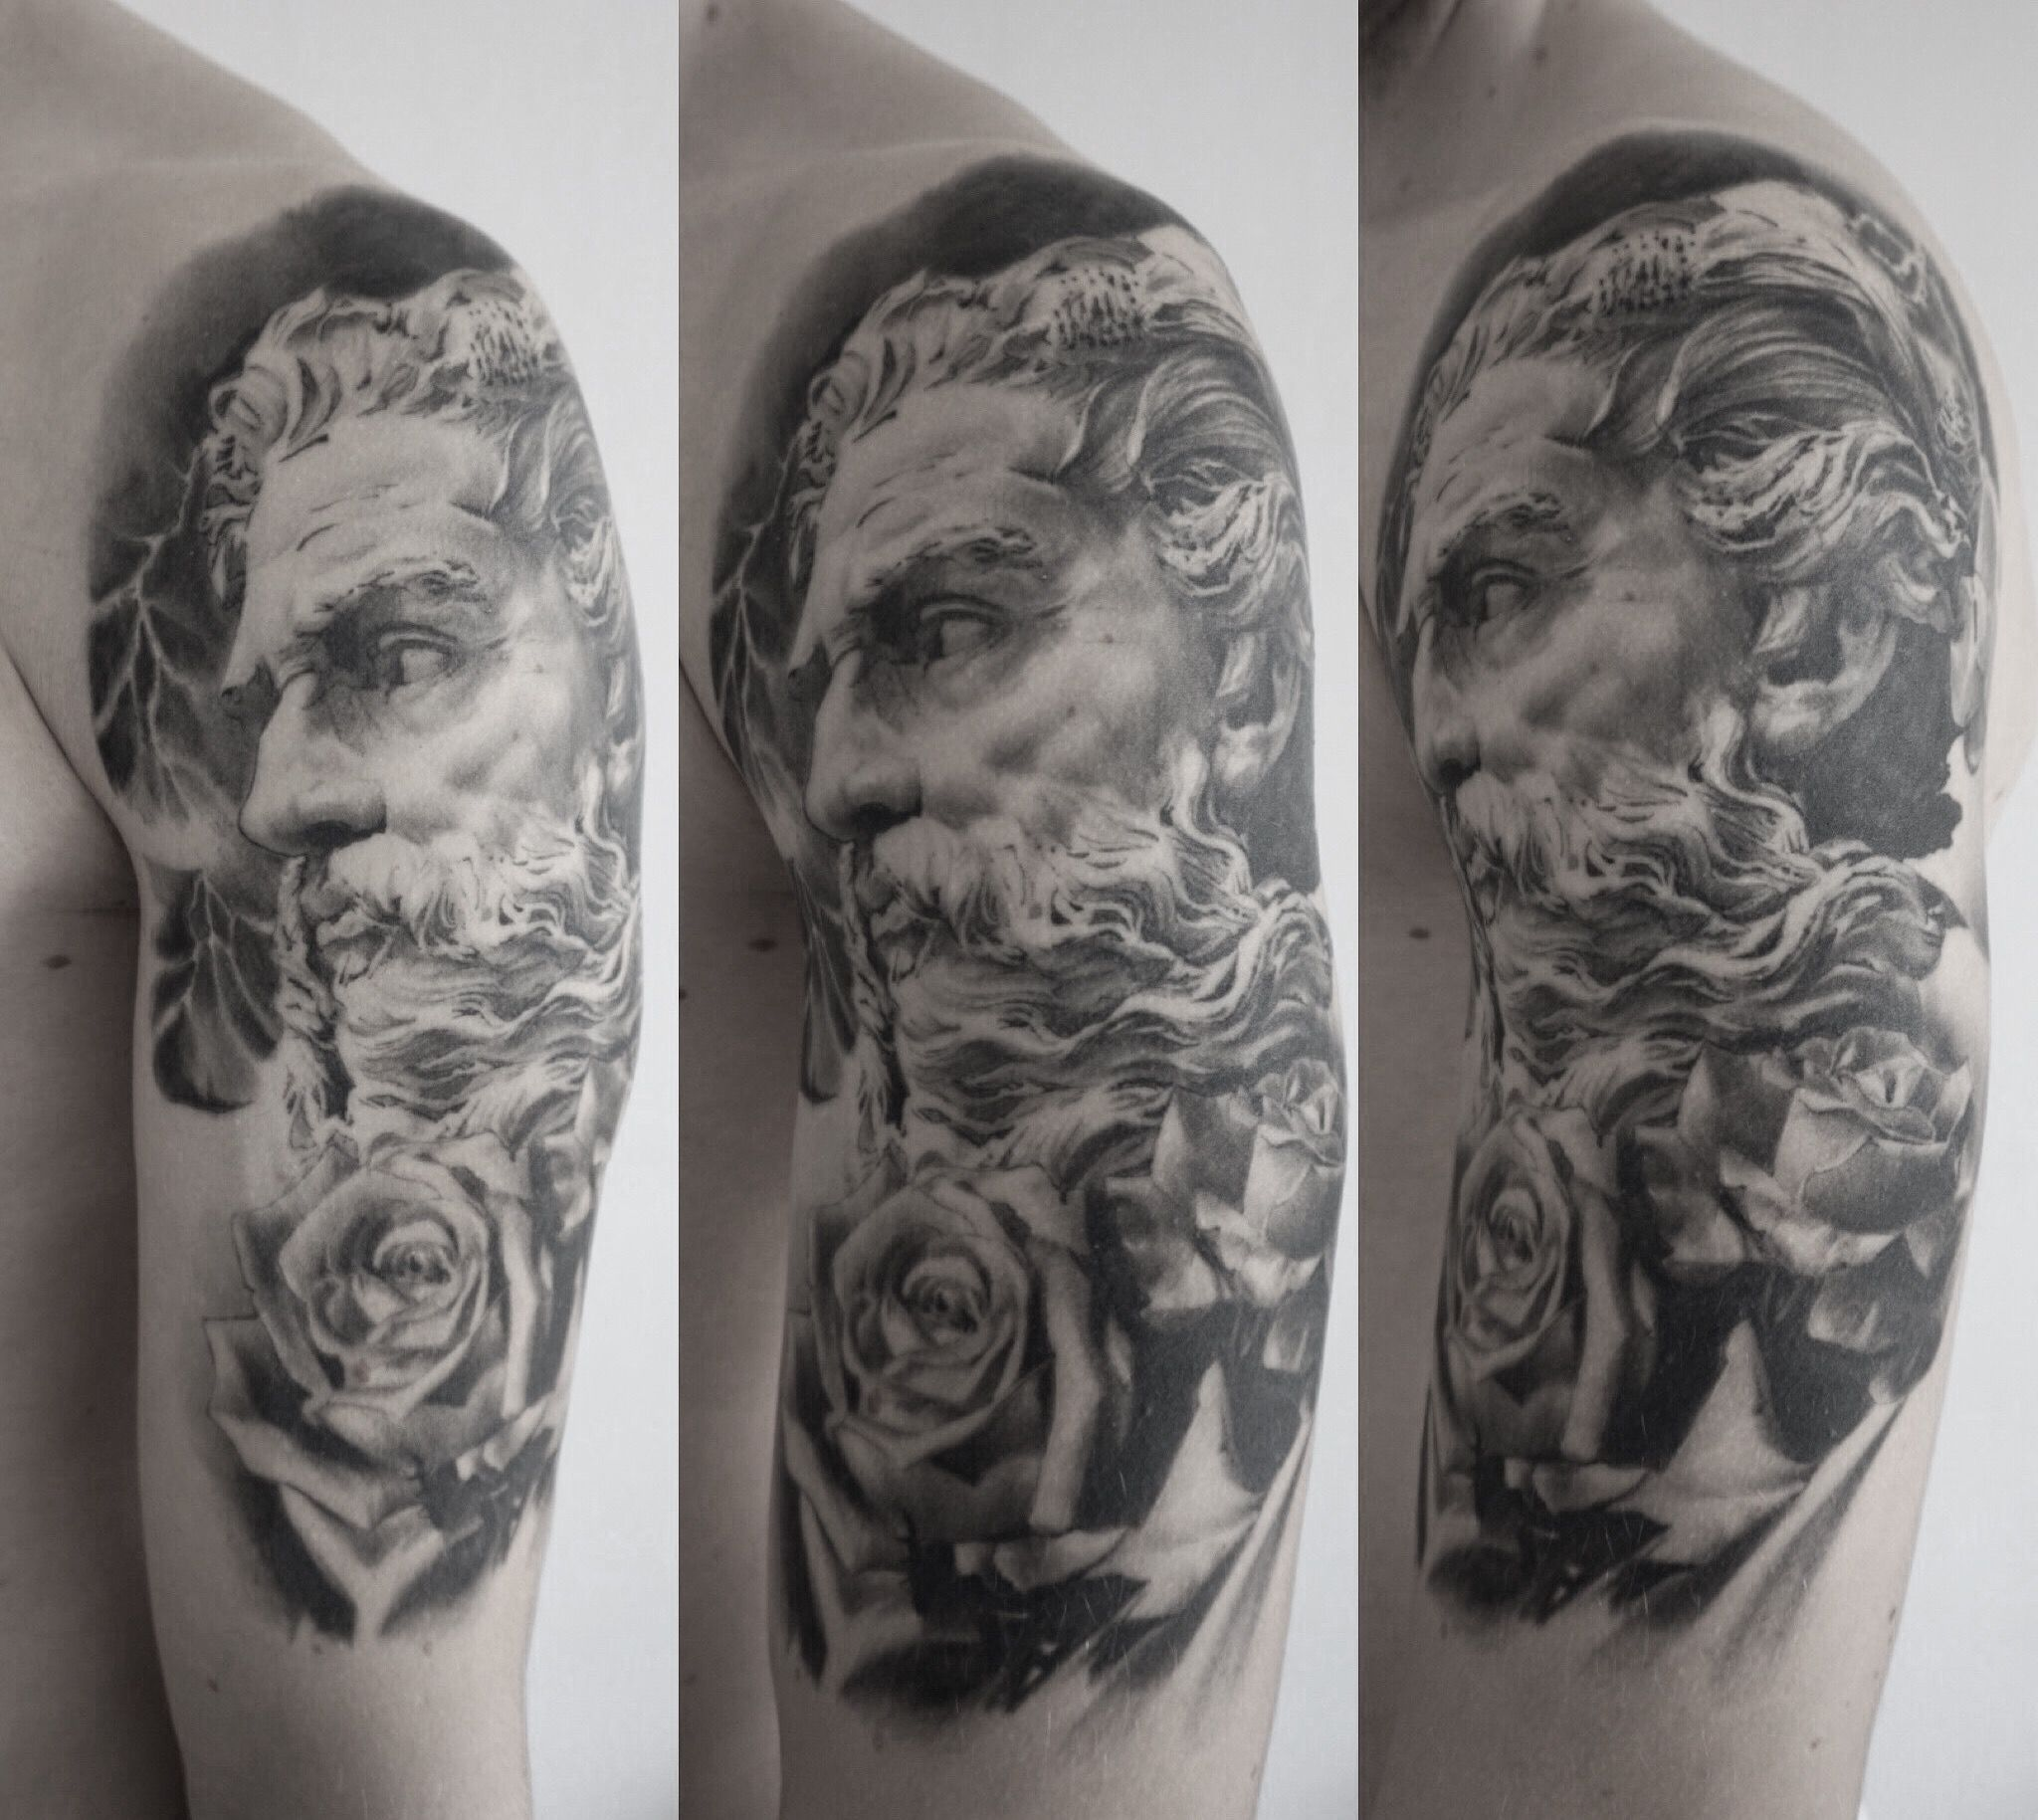 Zeus N Roses Tattoo Tattoo Zeus Greek God Rose Roses Lightning Bolt Blackandgrey Black Grey Sleeve Halfsleeve Portrait Ink Tattoos